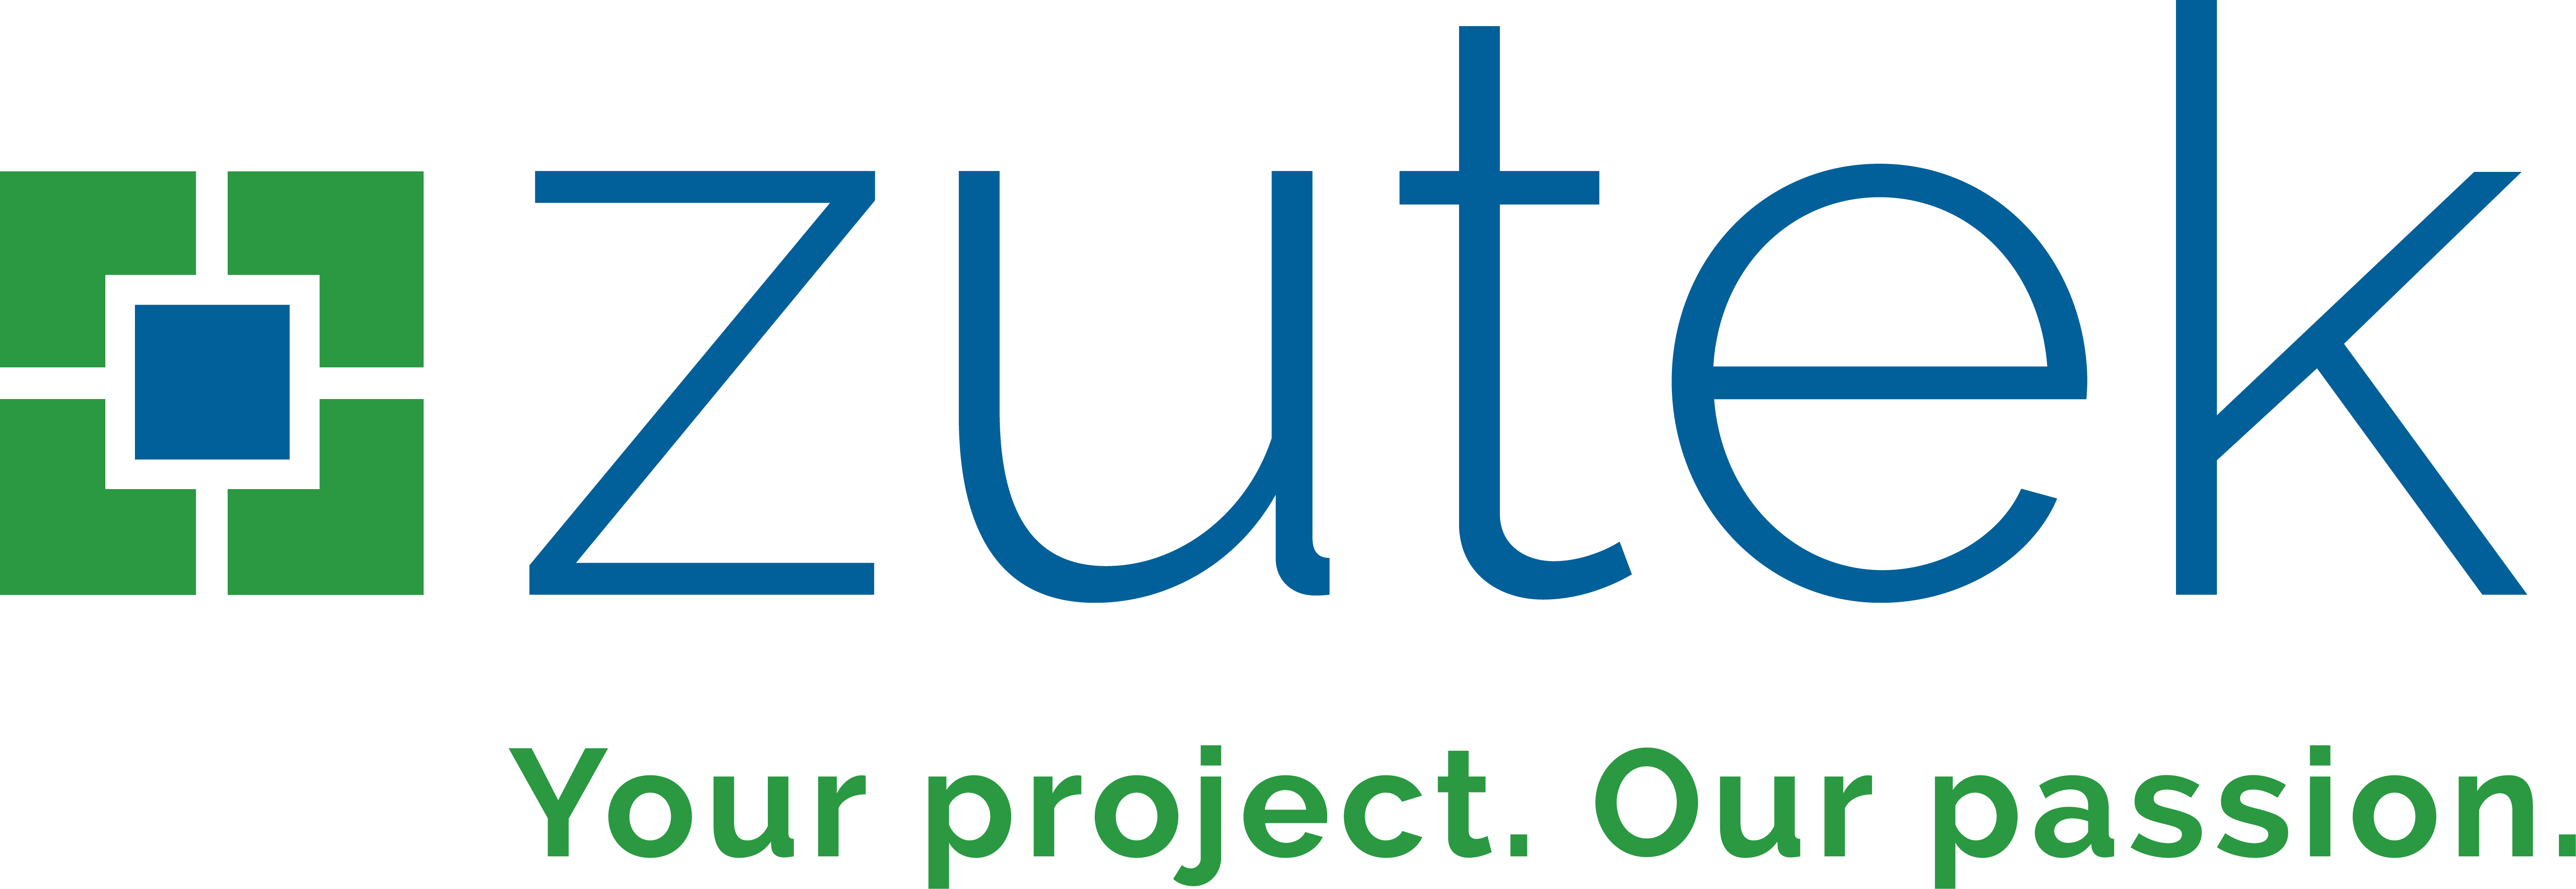 Zutek Logo Tagline